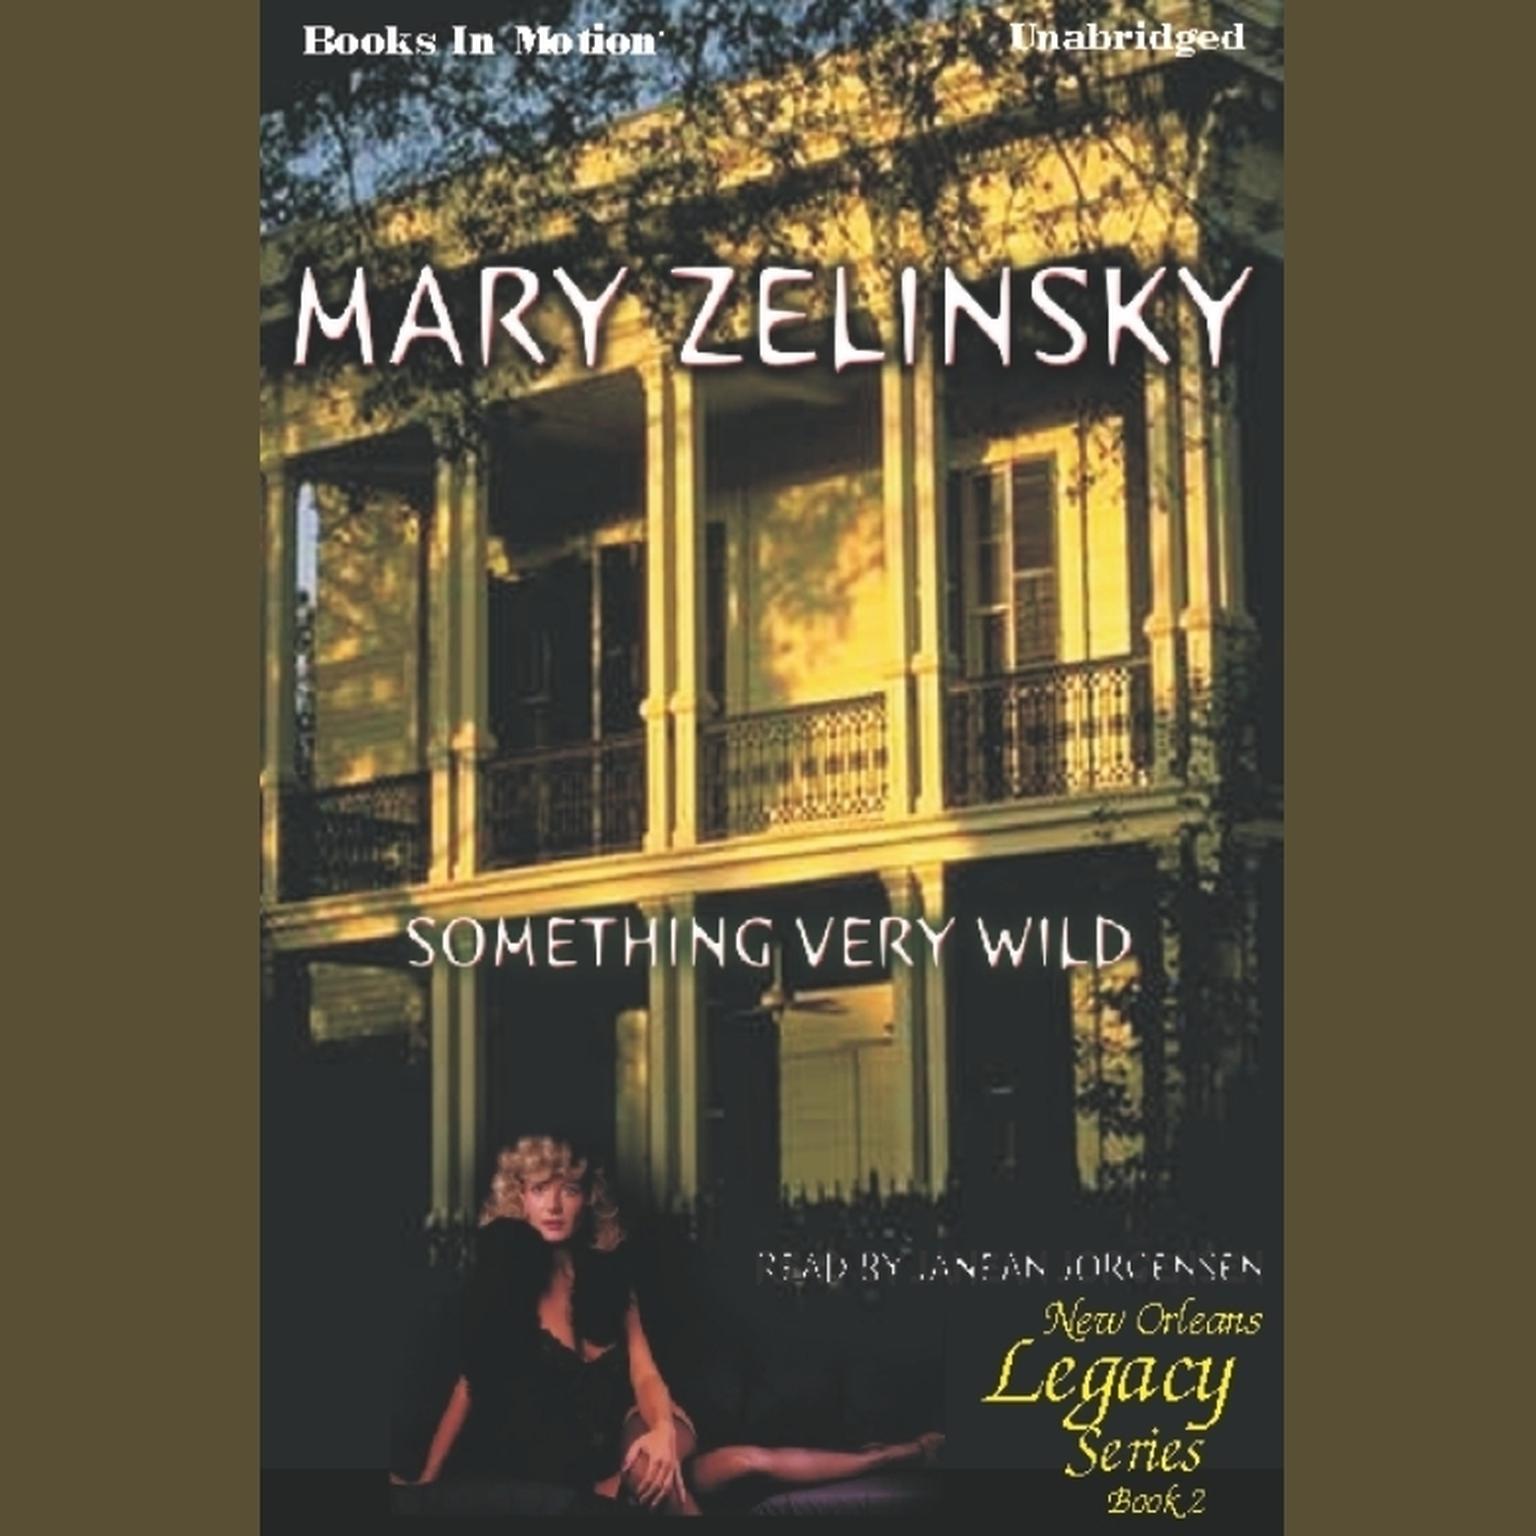 Something Very Wild Audiobook, by Mary Zelinsky